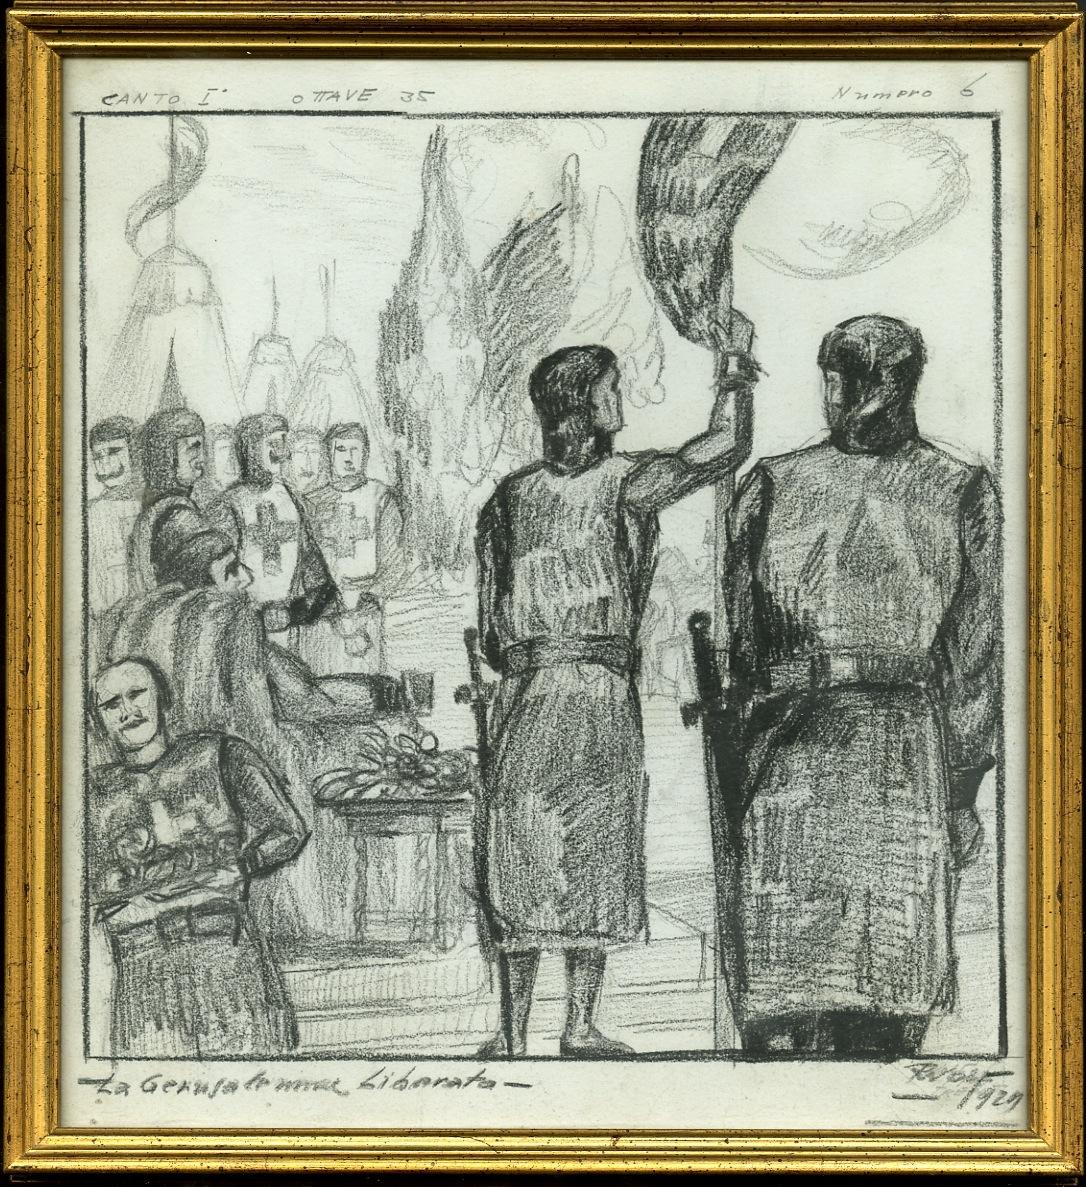 La Gerusalemme liberata, canto I, ottave 35, numero 6.